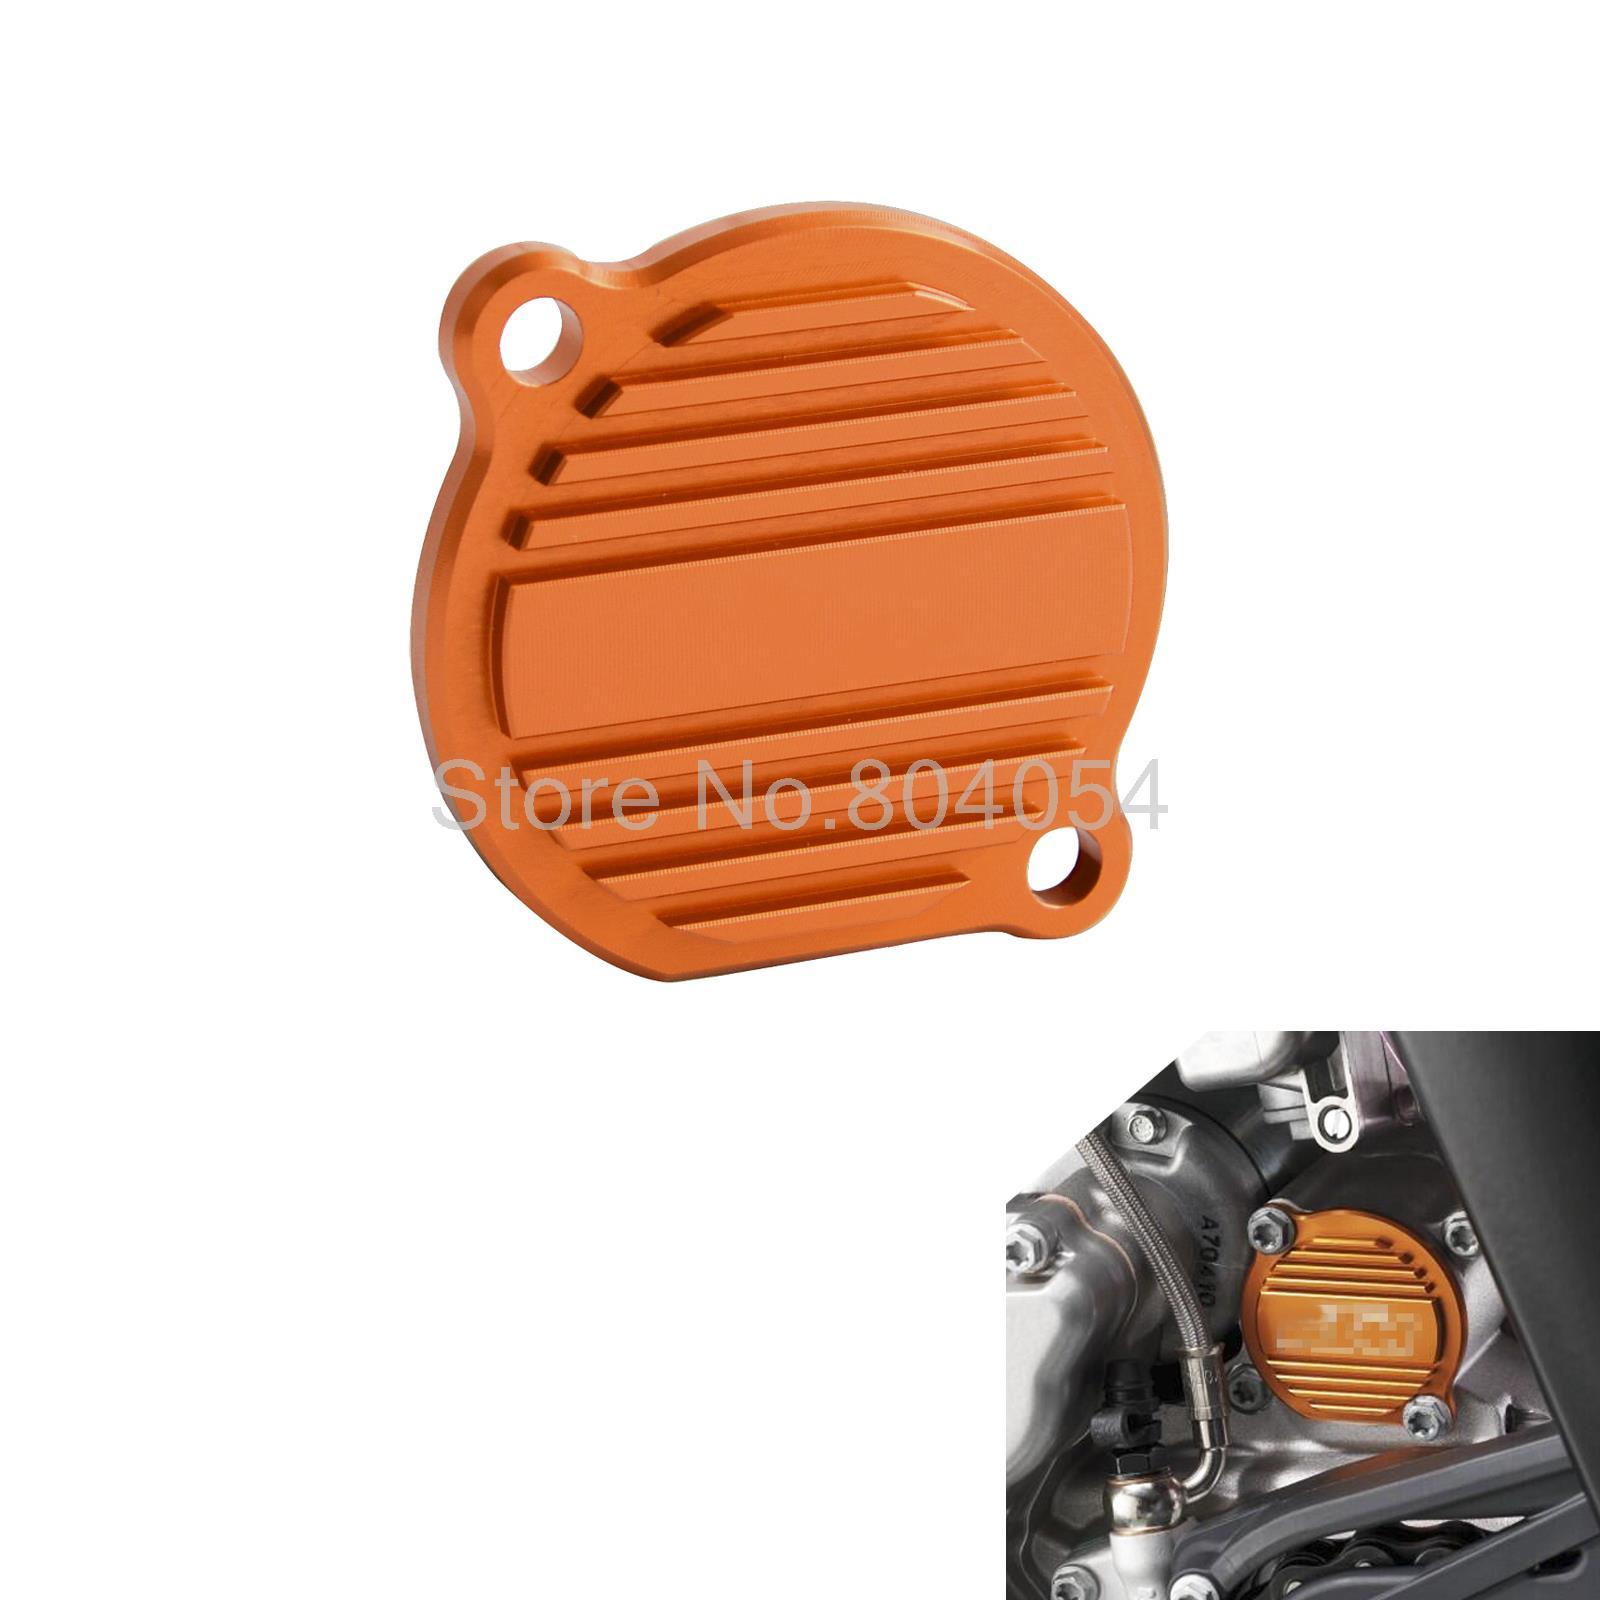 Orange Cnc Billet Pabrik Minyak Filter Penutup Untuk Ktm Sx Exc Xc Nokia Xl Oranye F Xcf W 250 400 450 520 525 540 950 990